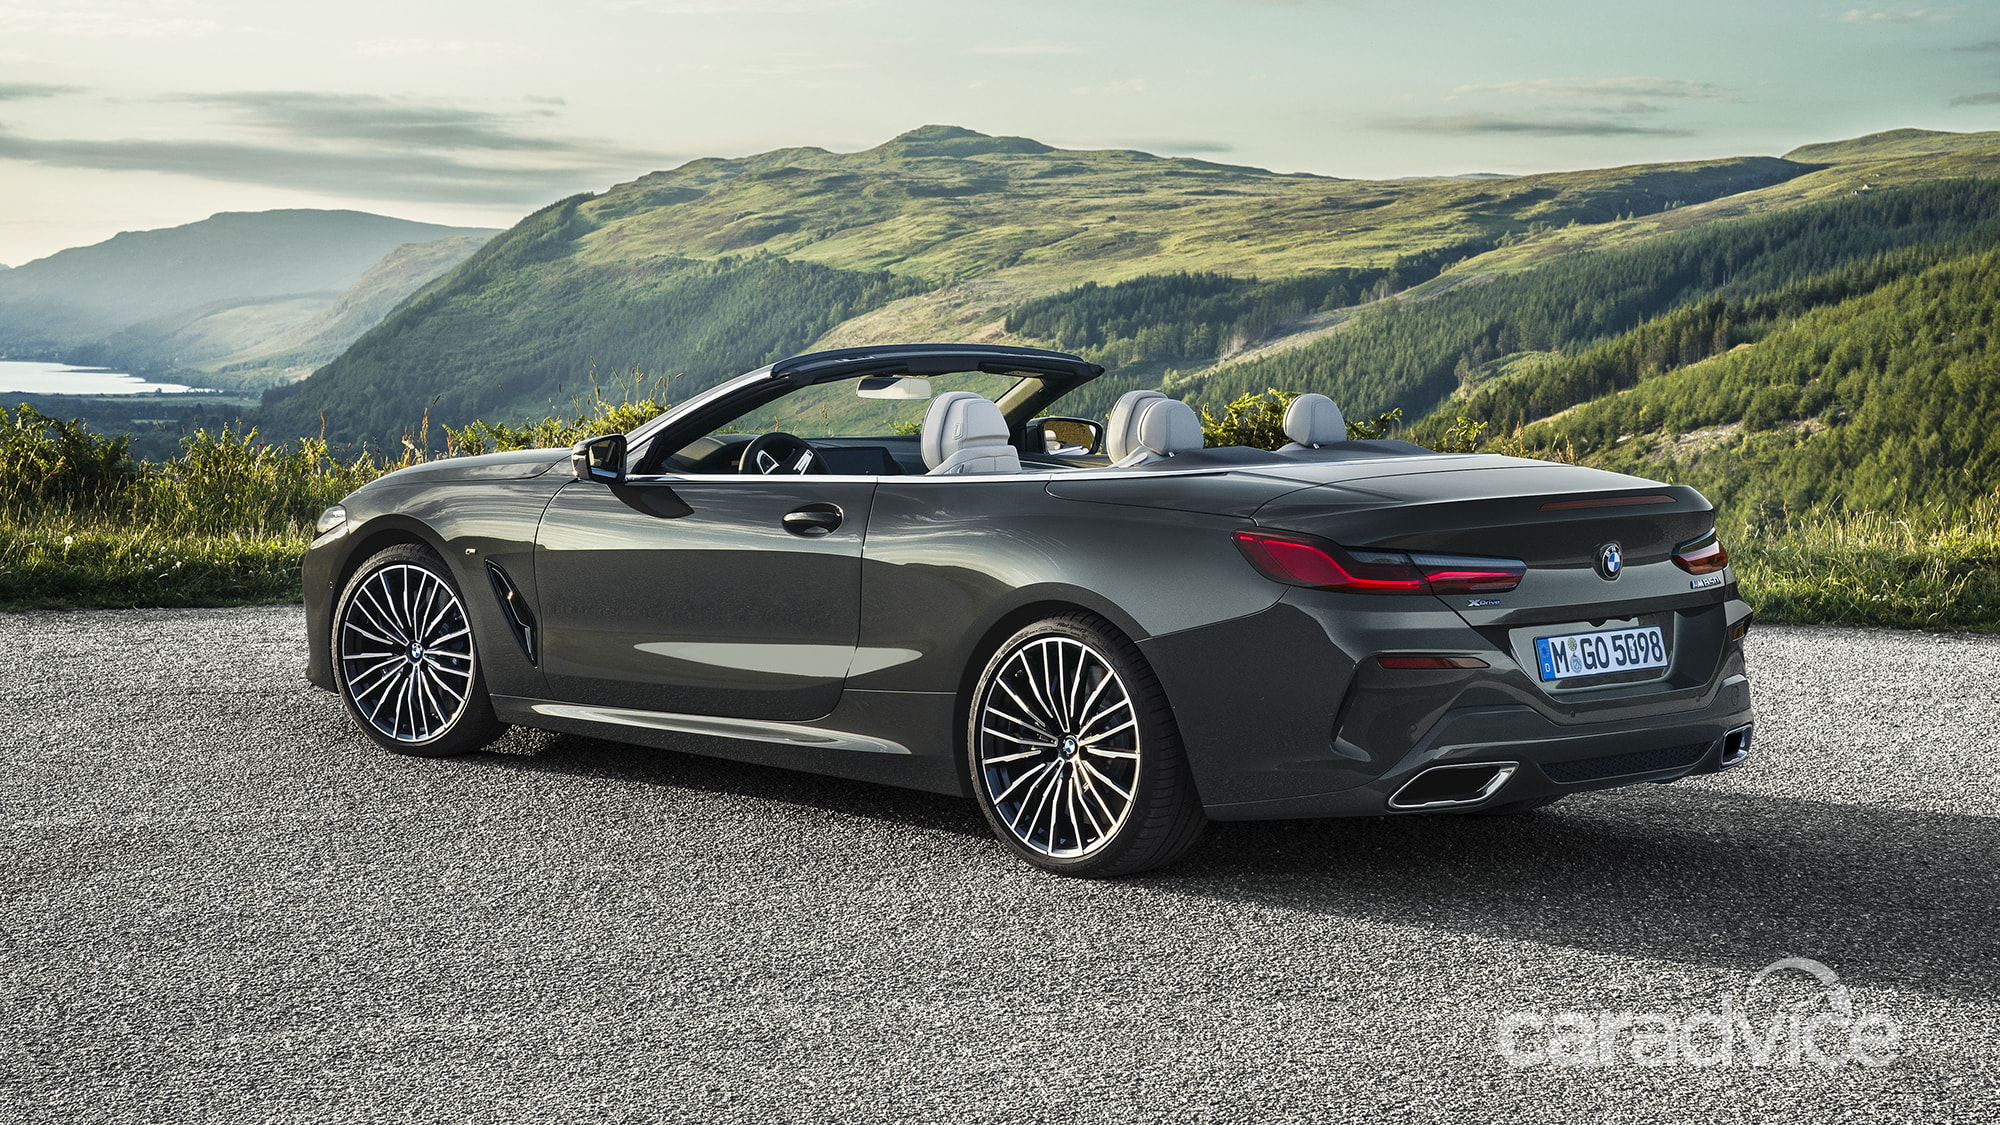 Comparison: BMW 8 Series Convertible vs Mercedes S-Class